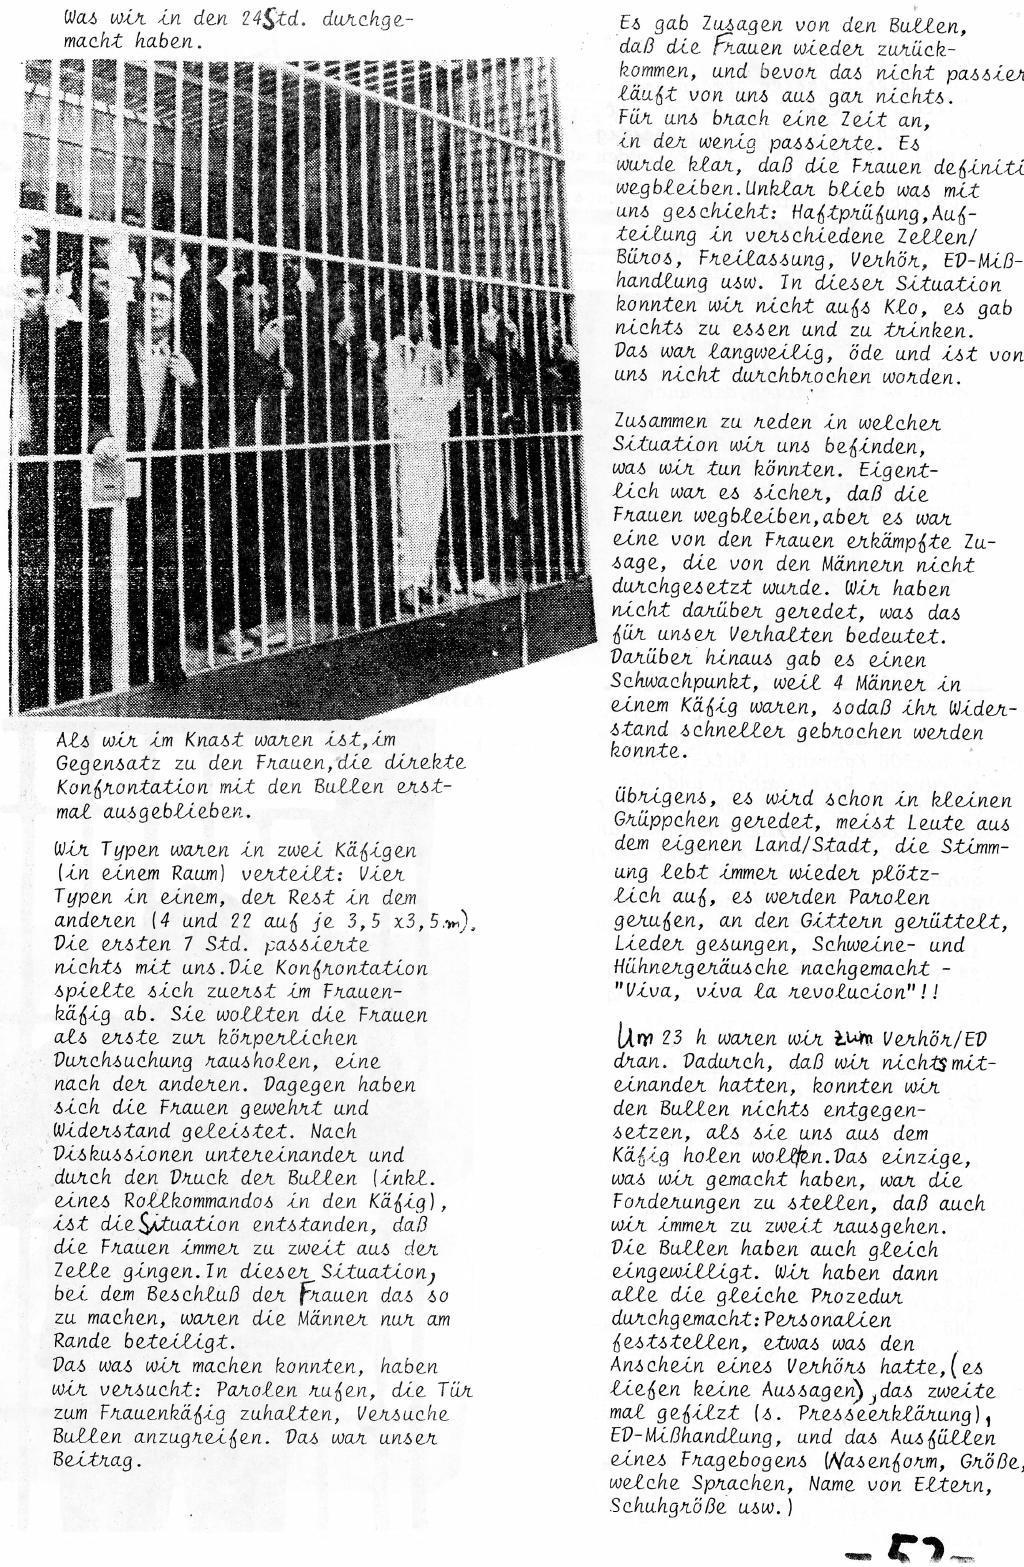 Belgien_Doku_Besetzung_EG_Kommission_1989_054